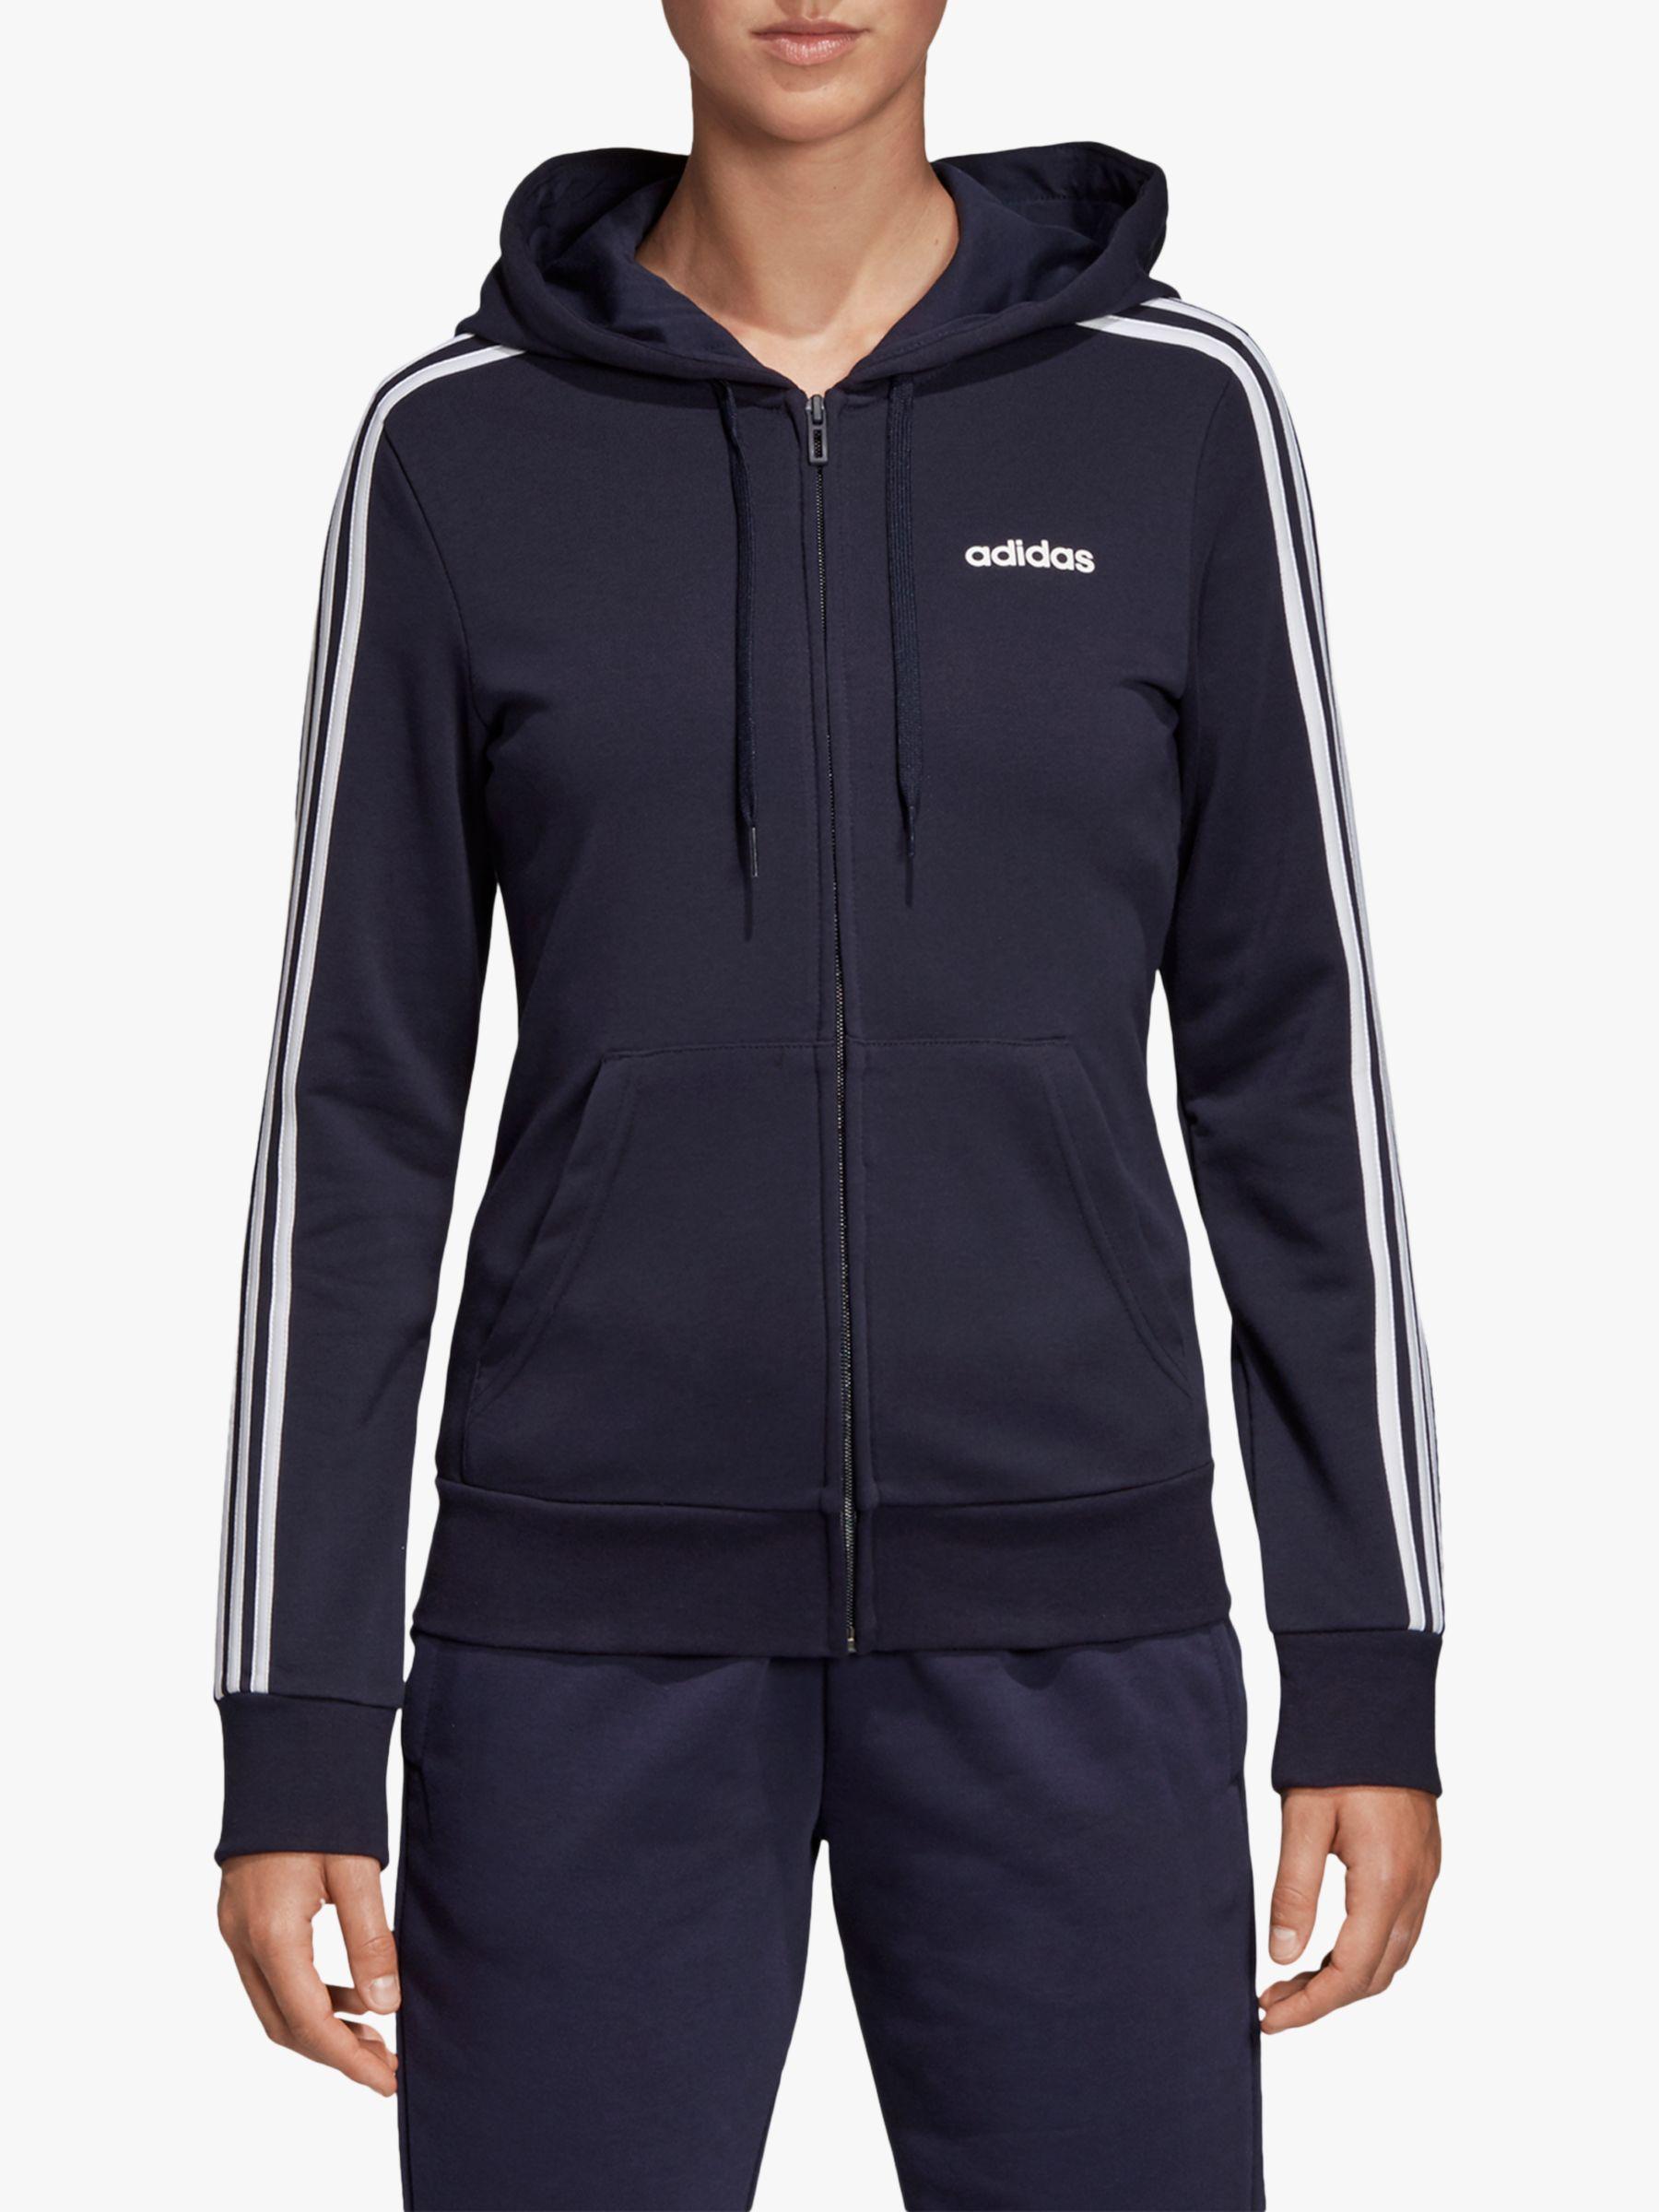 Adidas Essentials Womens 3-Stripes Sweatshirt